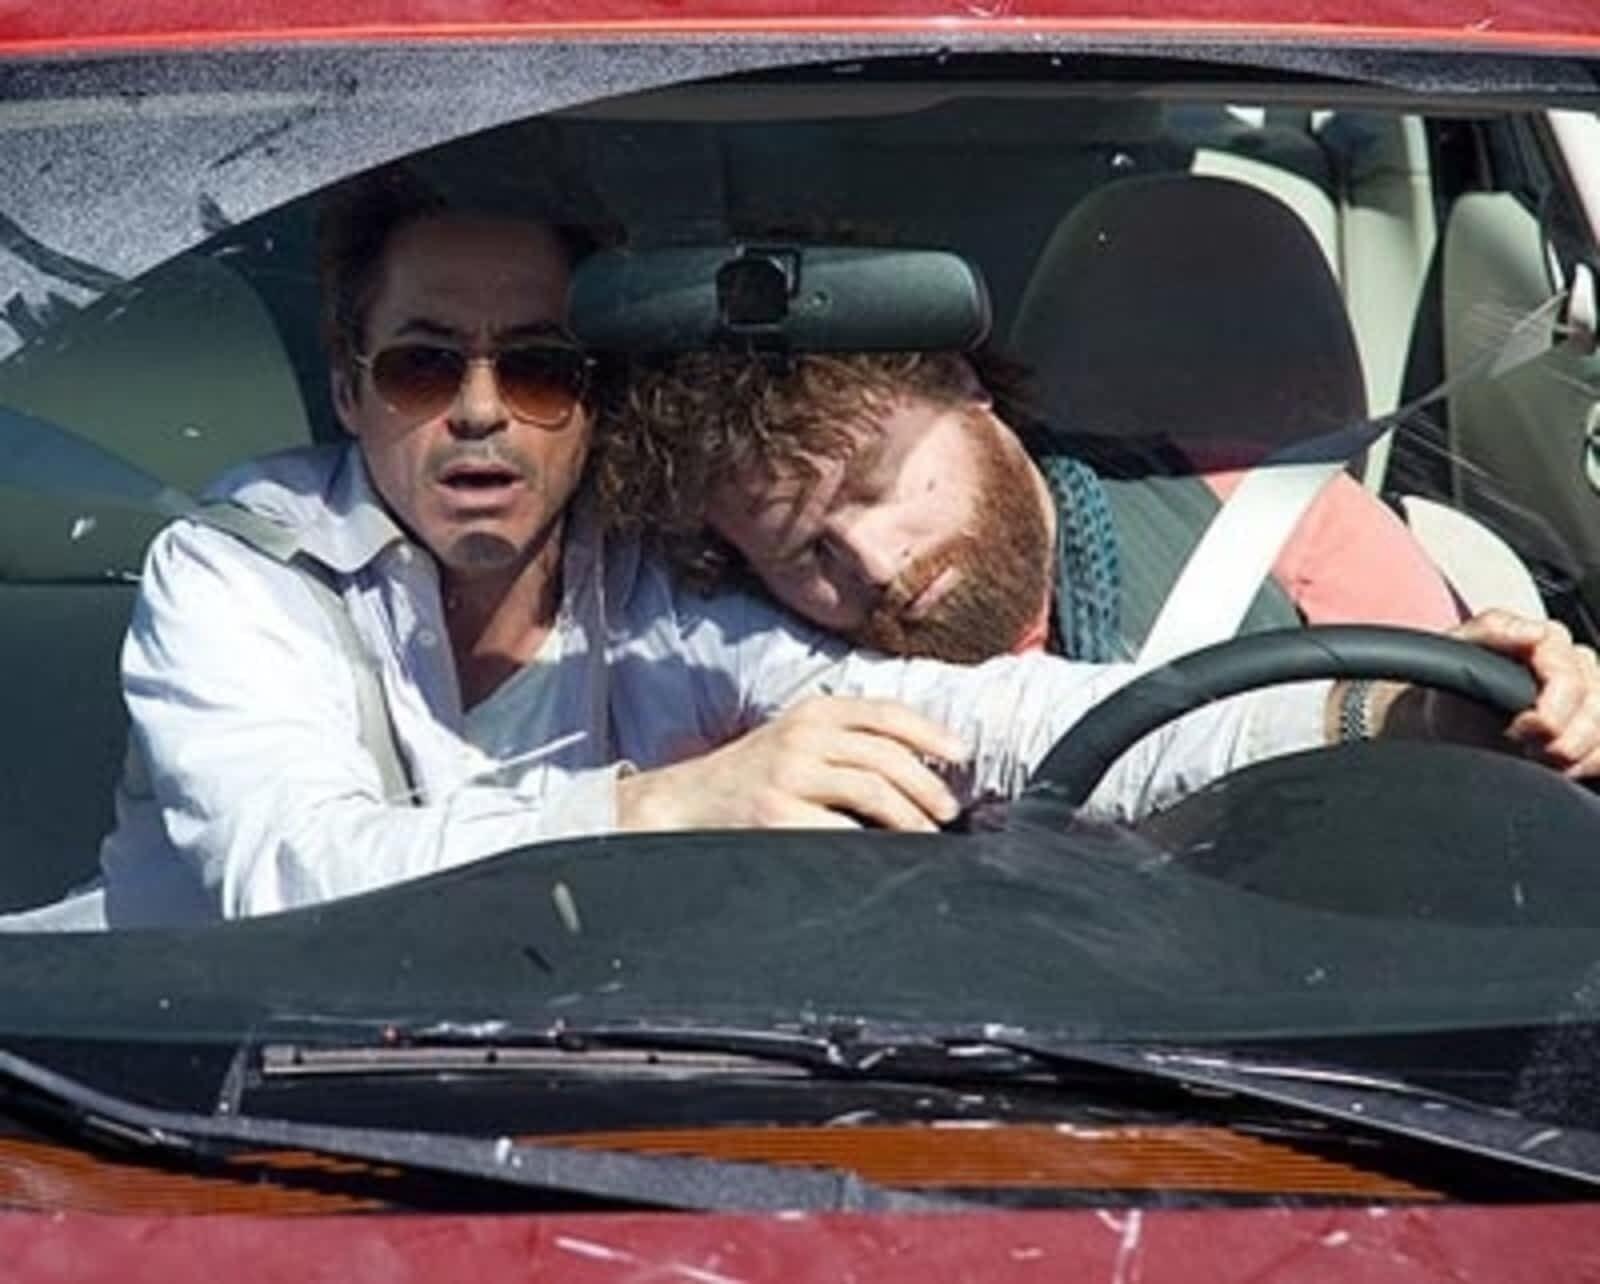 Kenali Microsleep, Kondisi Tidur Beberapa Detik yang Bikin Kecelakaan